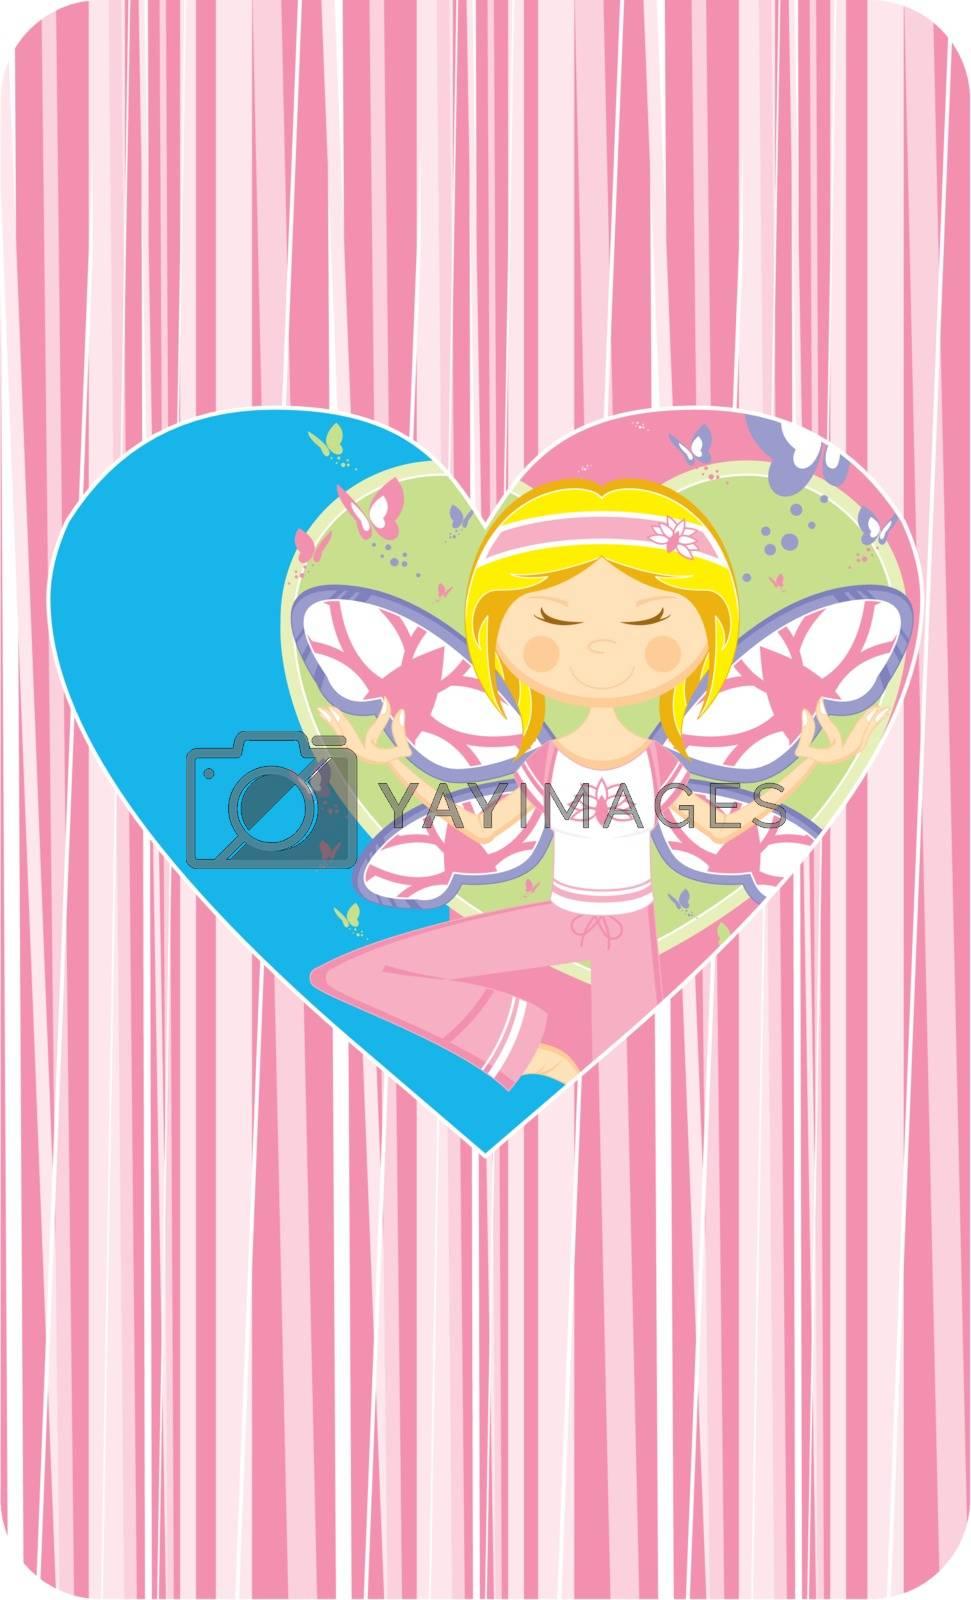 Valentine Yoga Girl with Butterflies by markmurphycreative